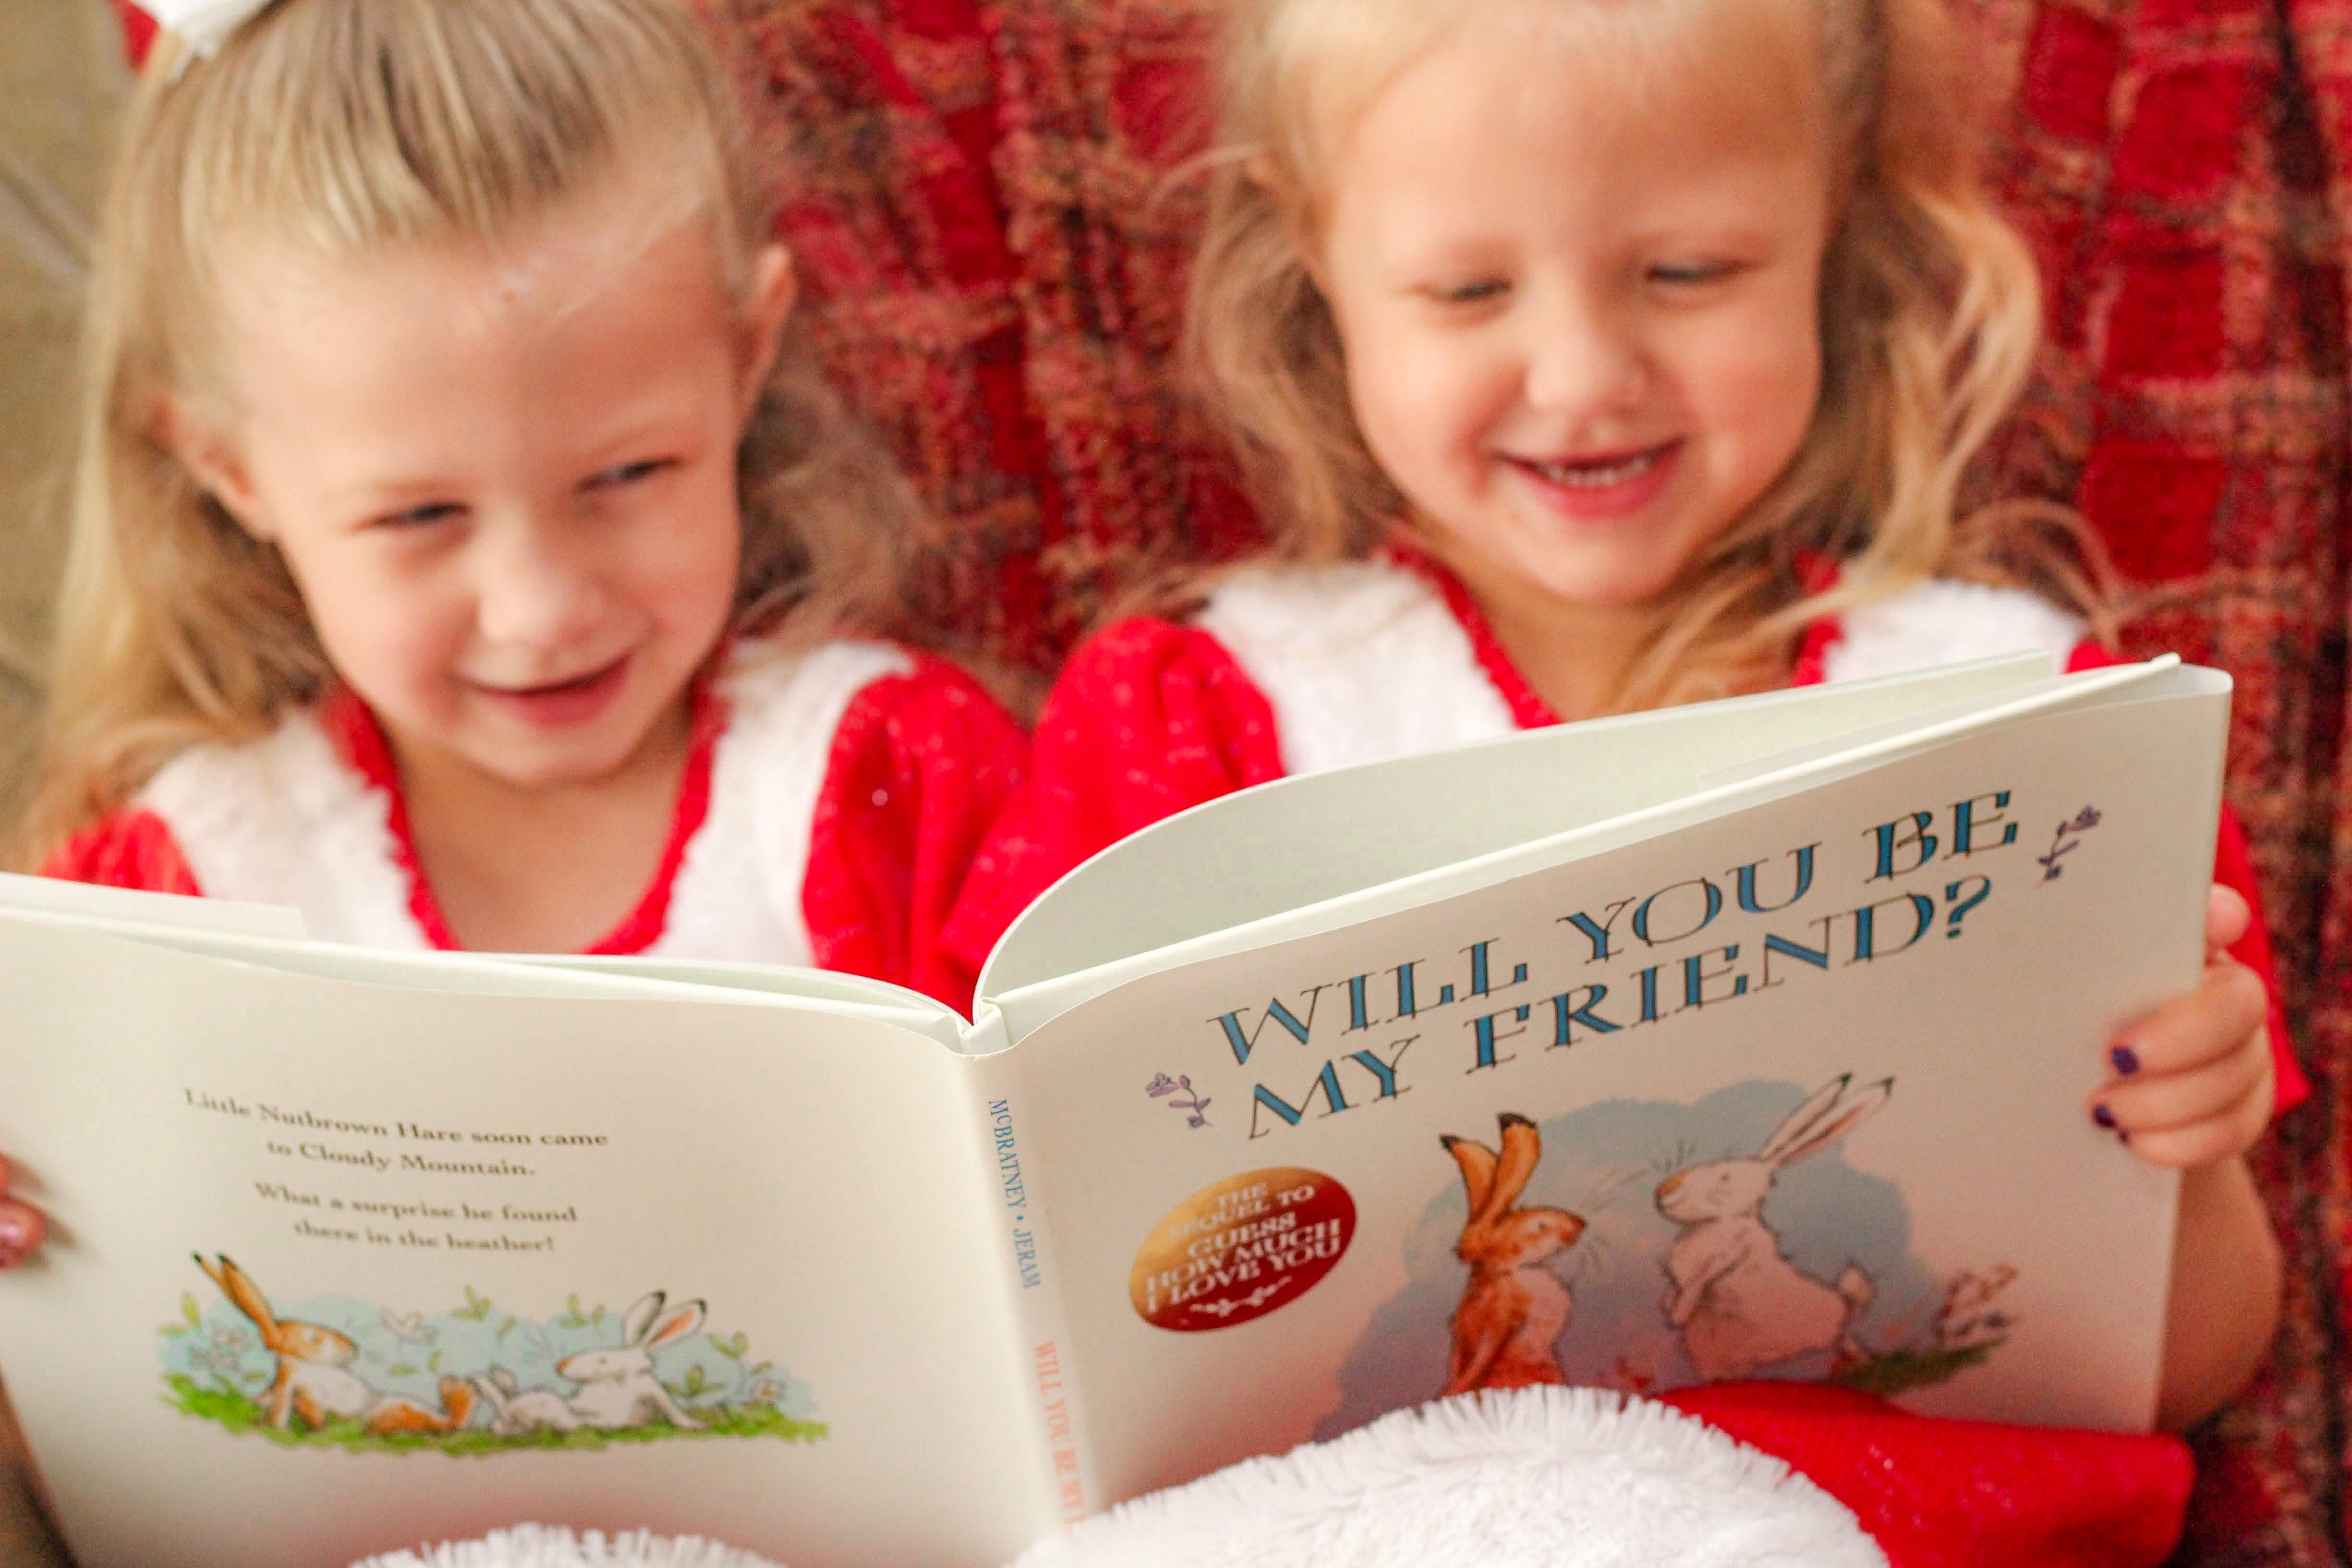 Meaningful Read: Children's Friendship Books